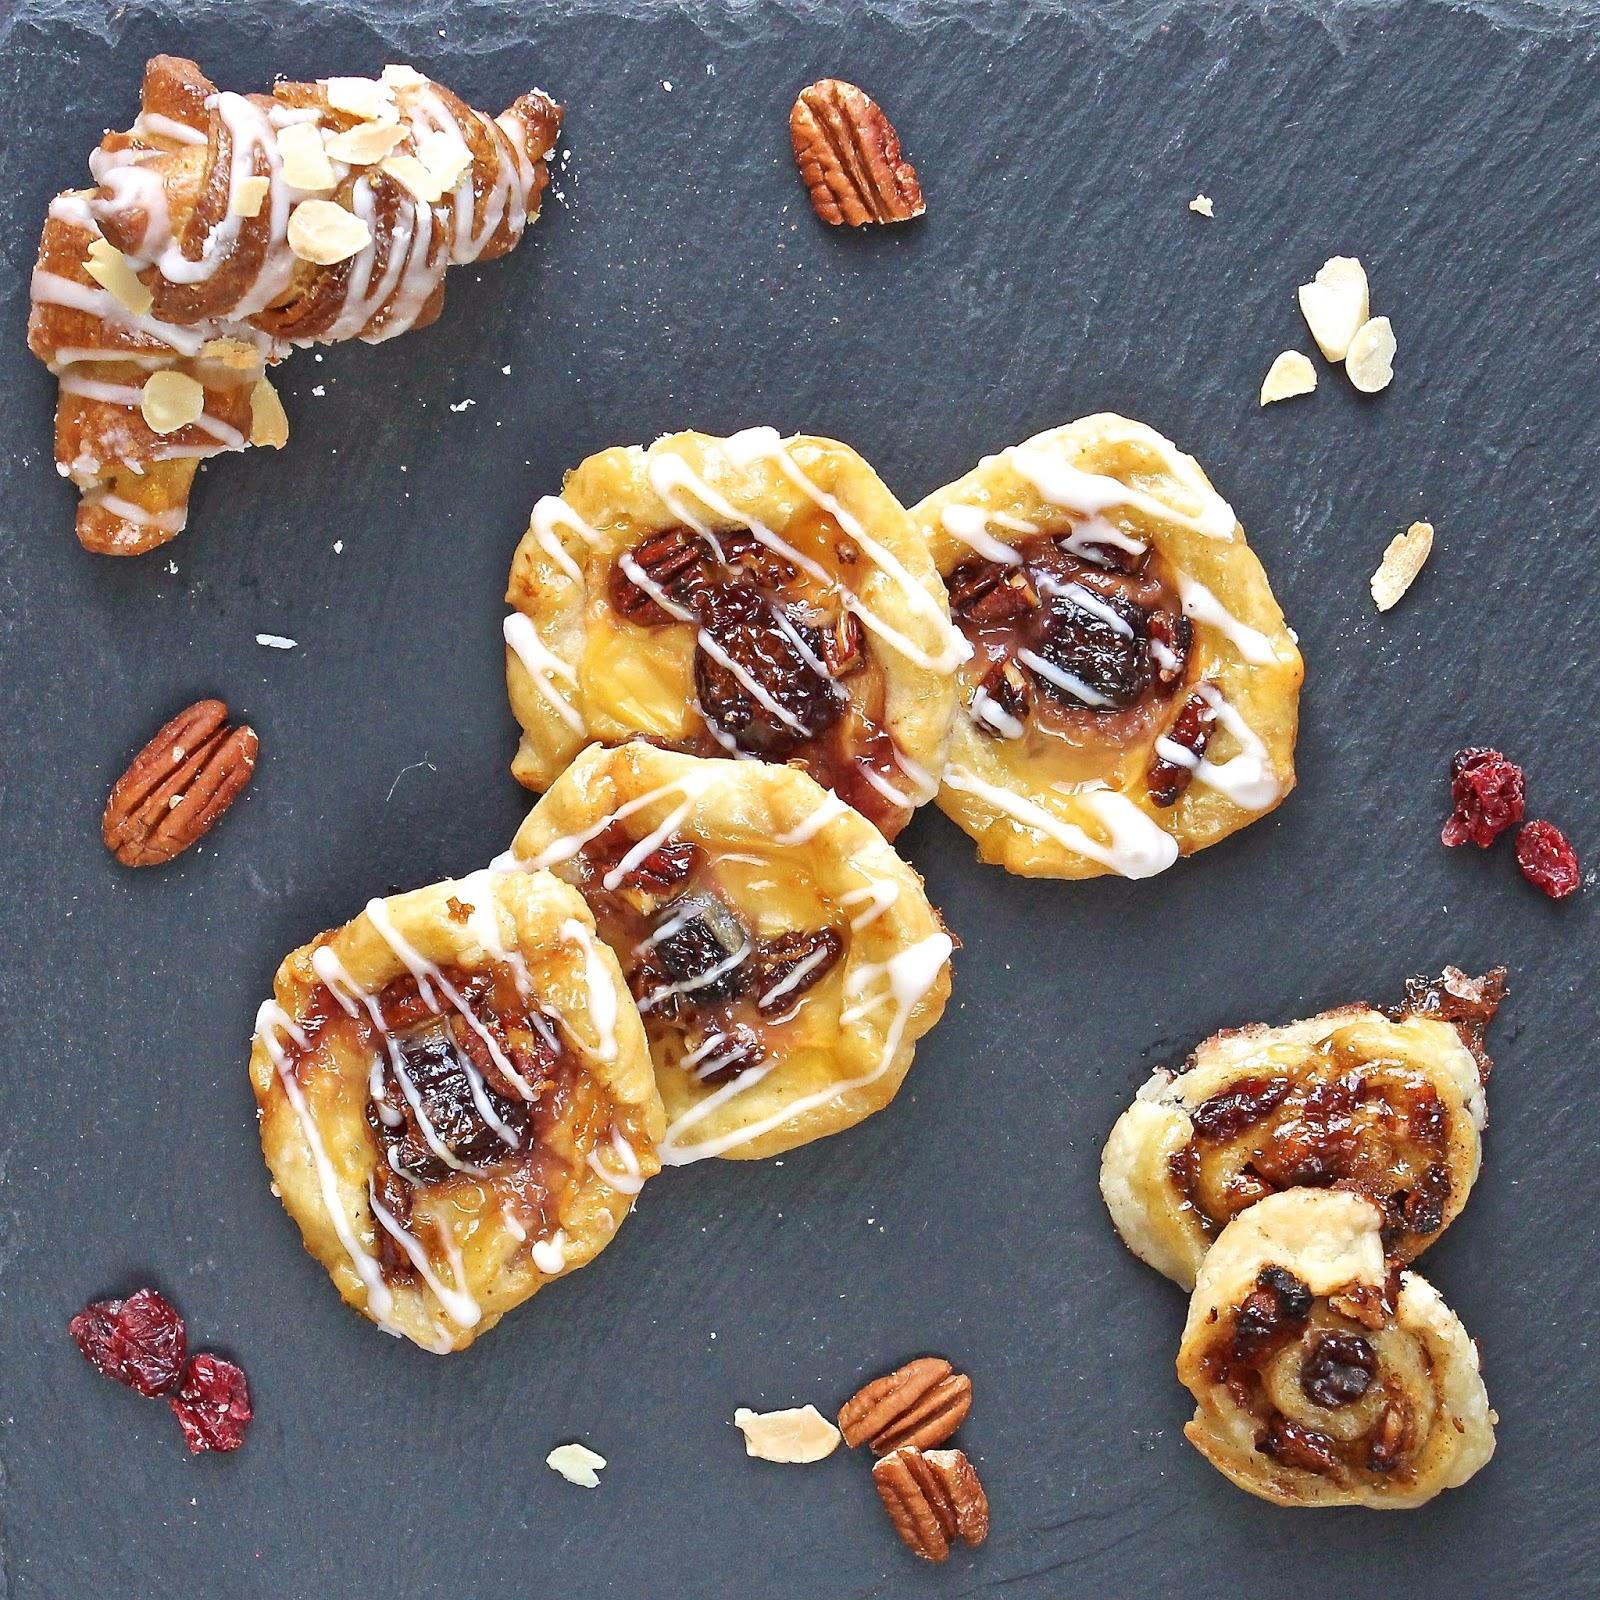 Gluten Free Alchemist: A Selection of gluten free Breakfast Pastries ...